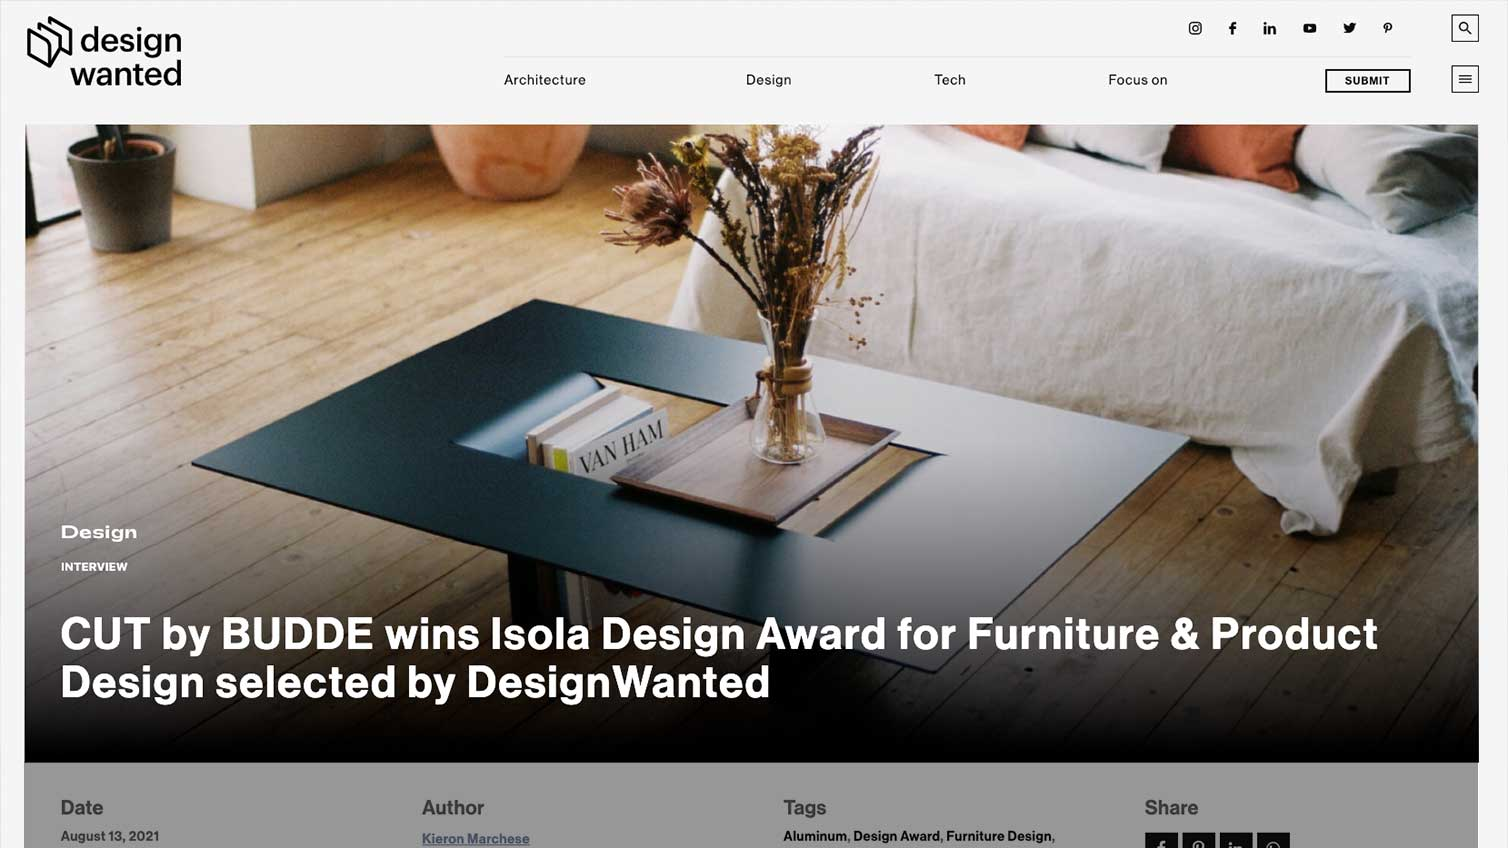 designwanted-magazine-repost